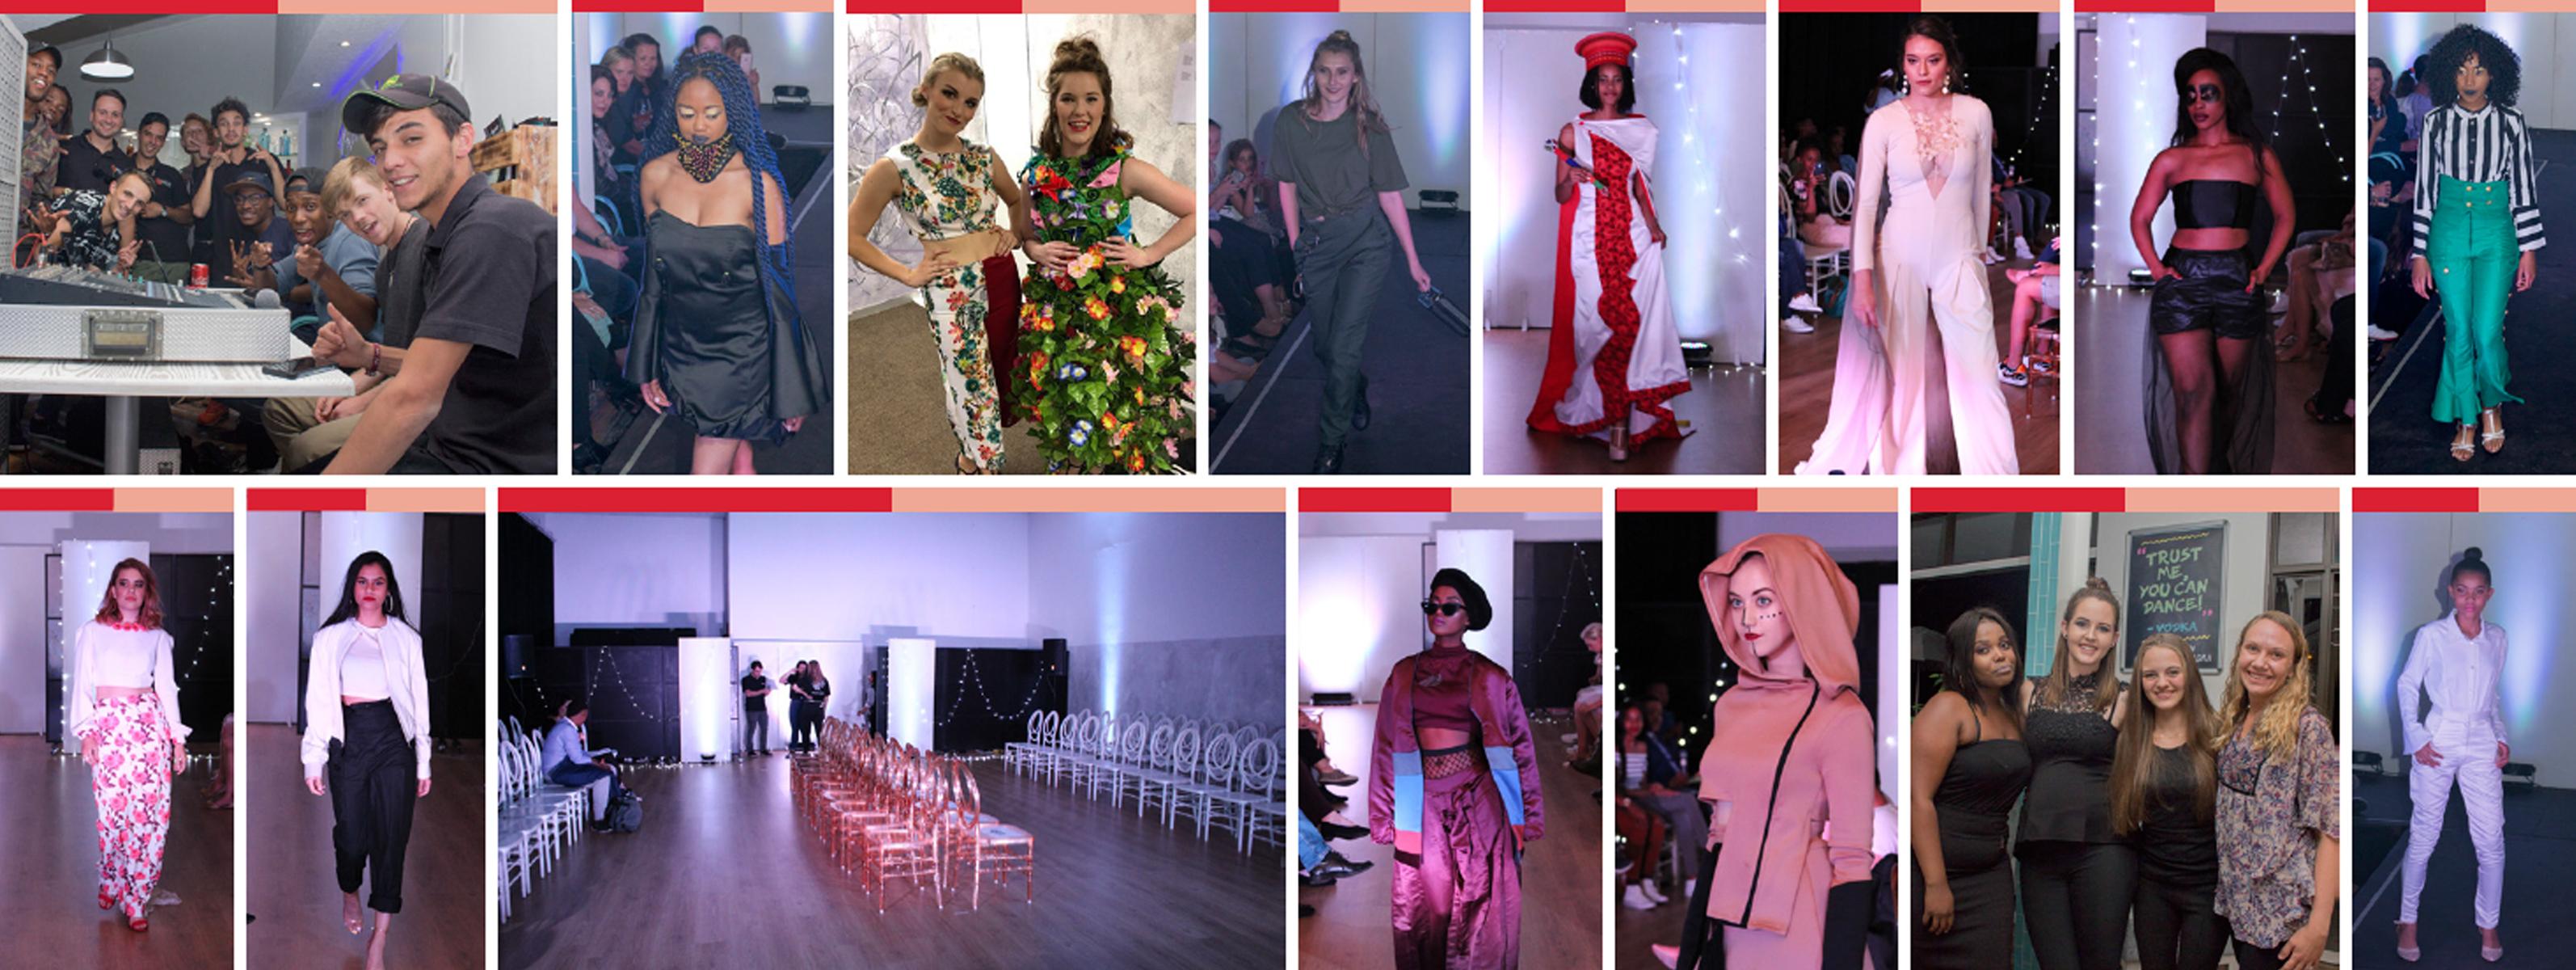 Fashion Design students images